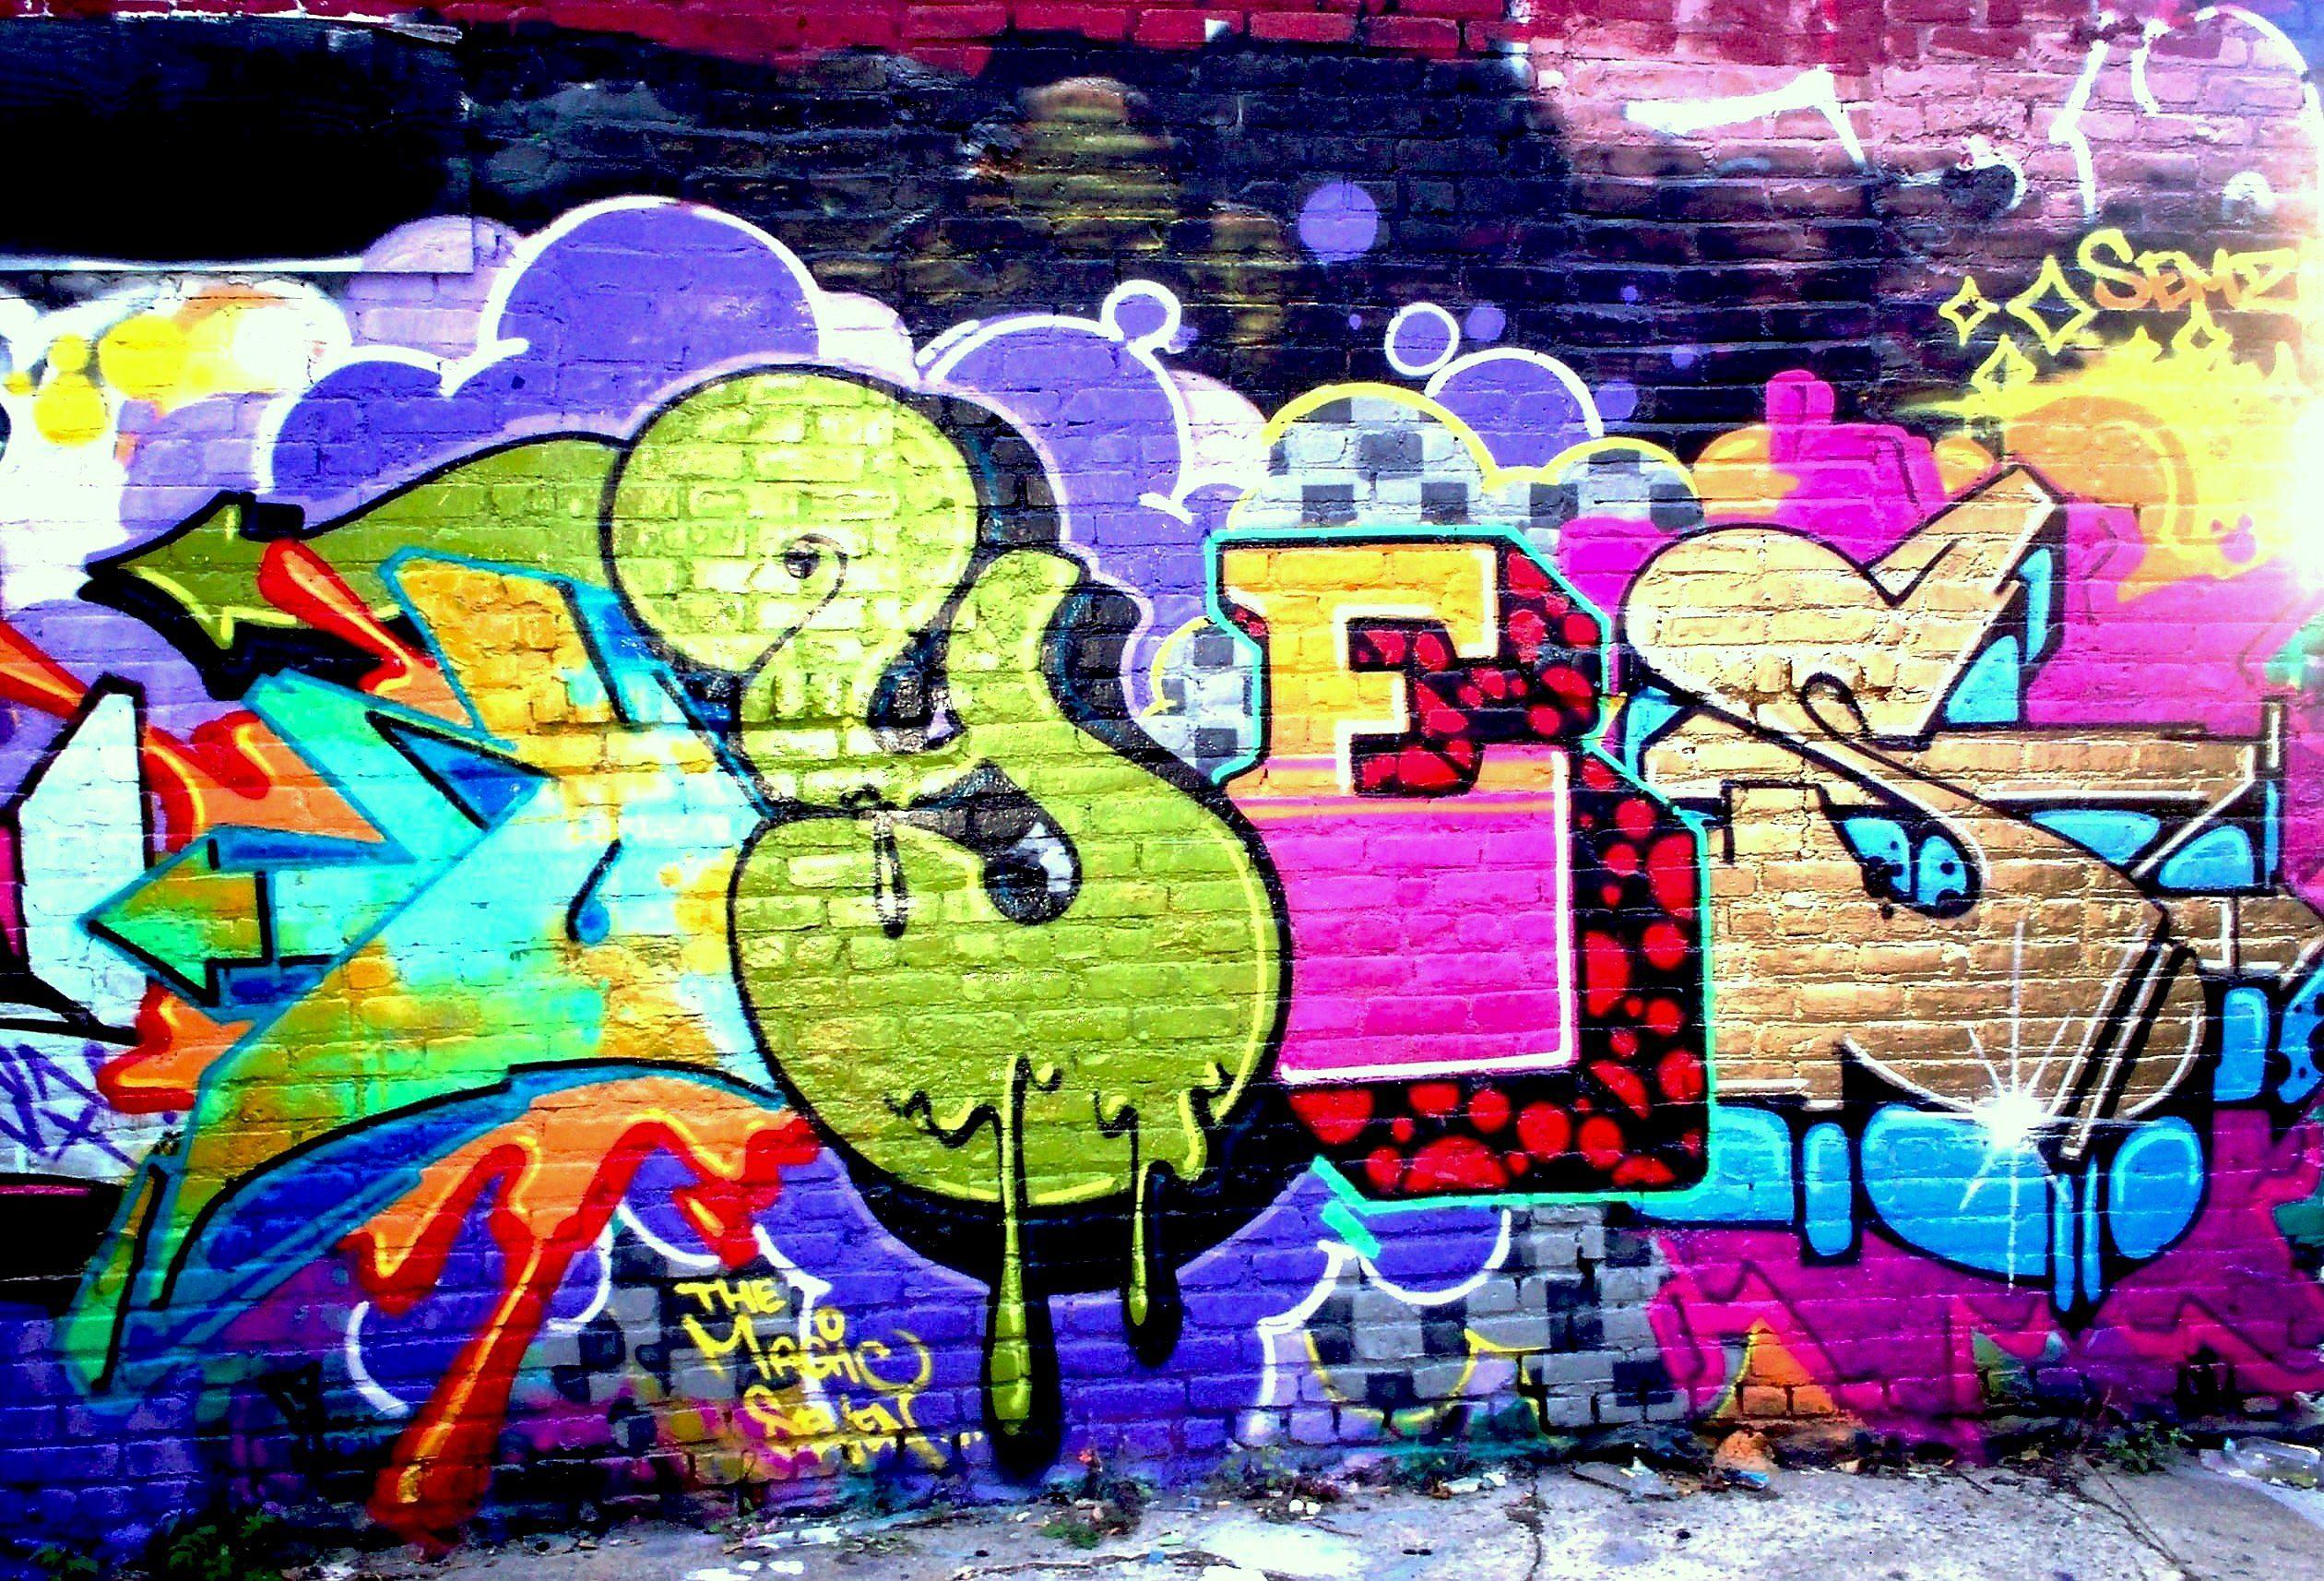 Graffiti wall pictures - Artistic Graffiti Wallpaper Background 2520 X 1714 Id 56492 Wallpaper Abyss